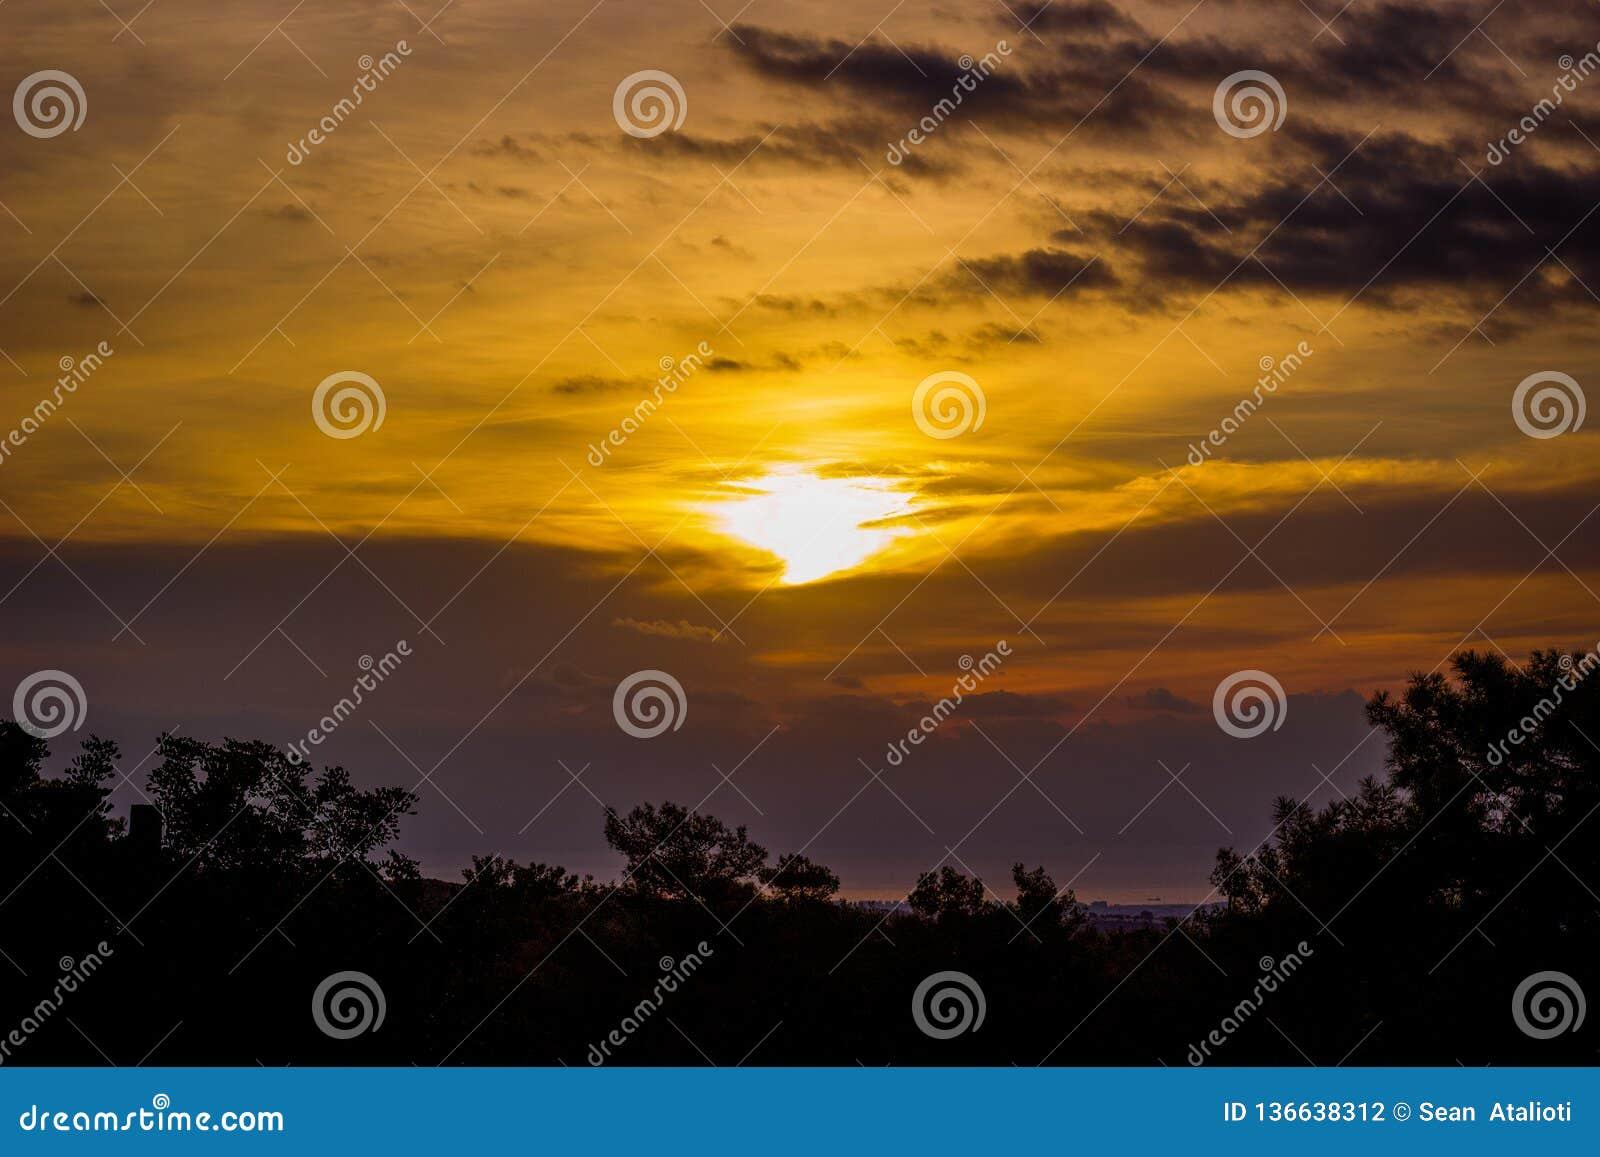 Sun Rise over the Mediterrean Sea